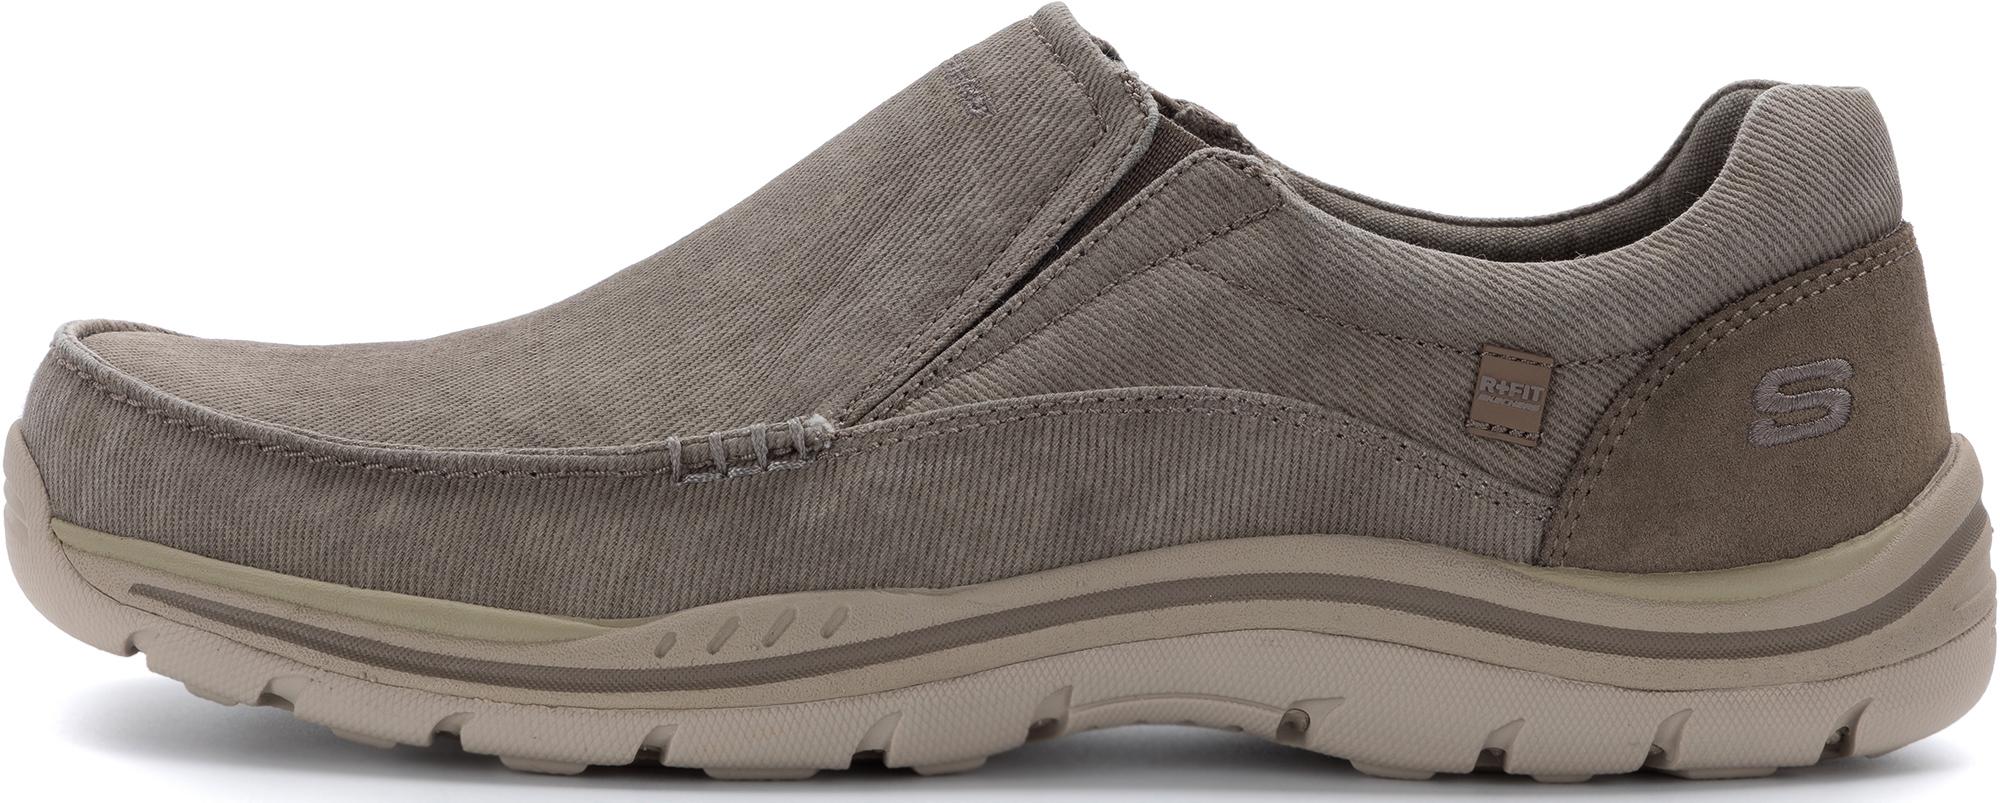 Skechers Полуботинки мужские Expected-Avillo, размер 40,5